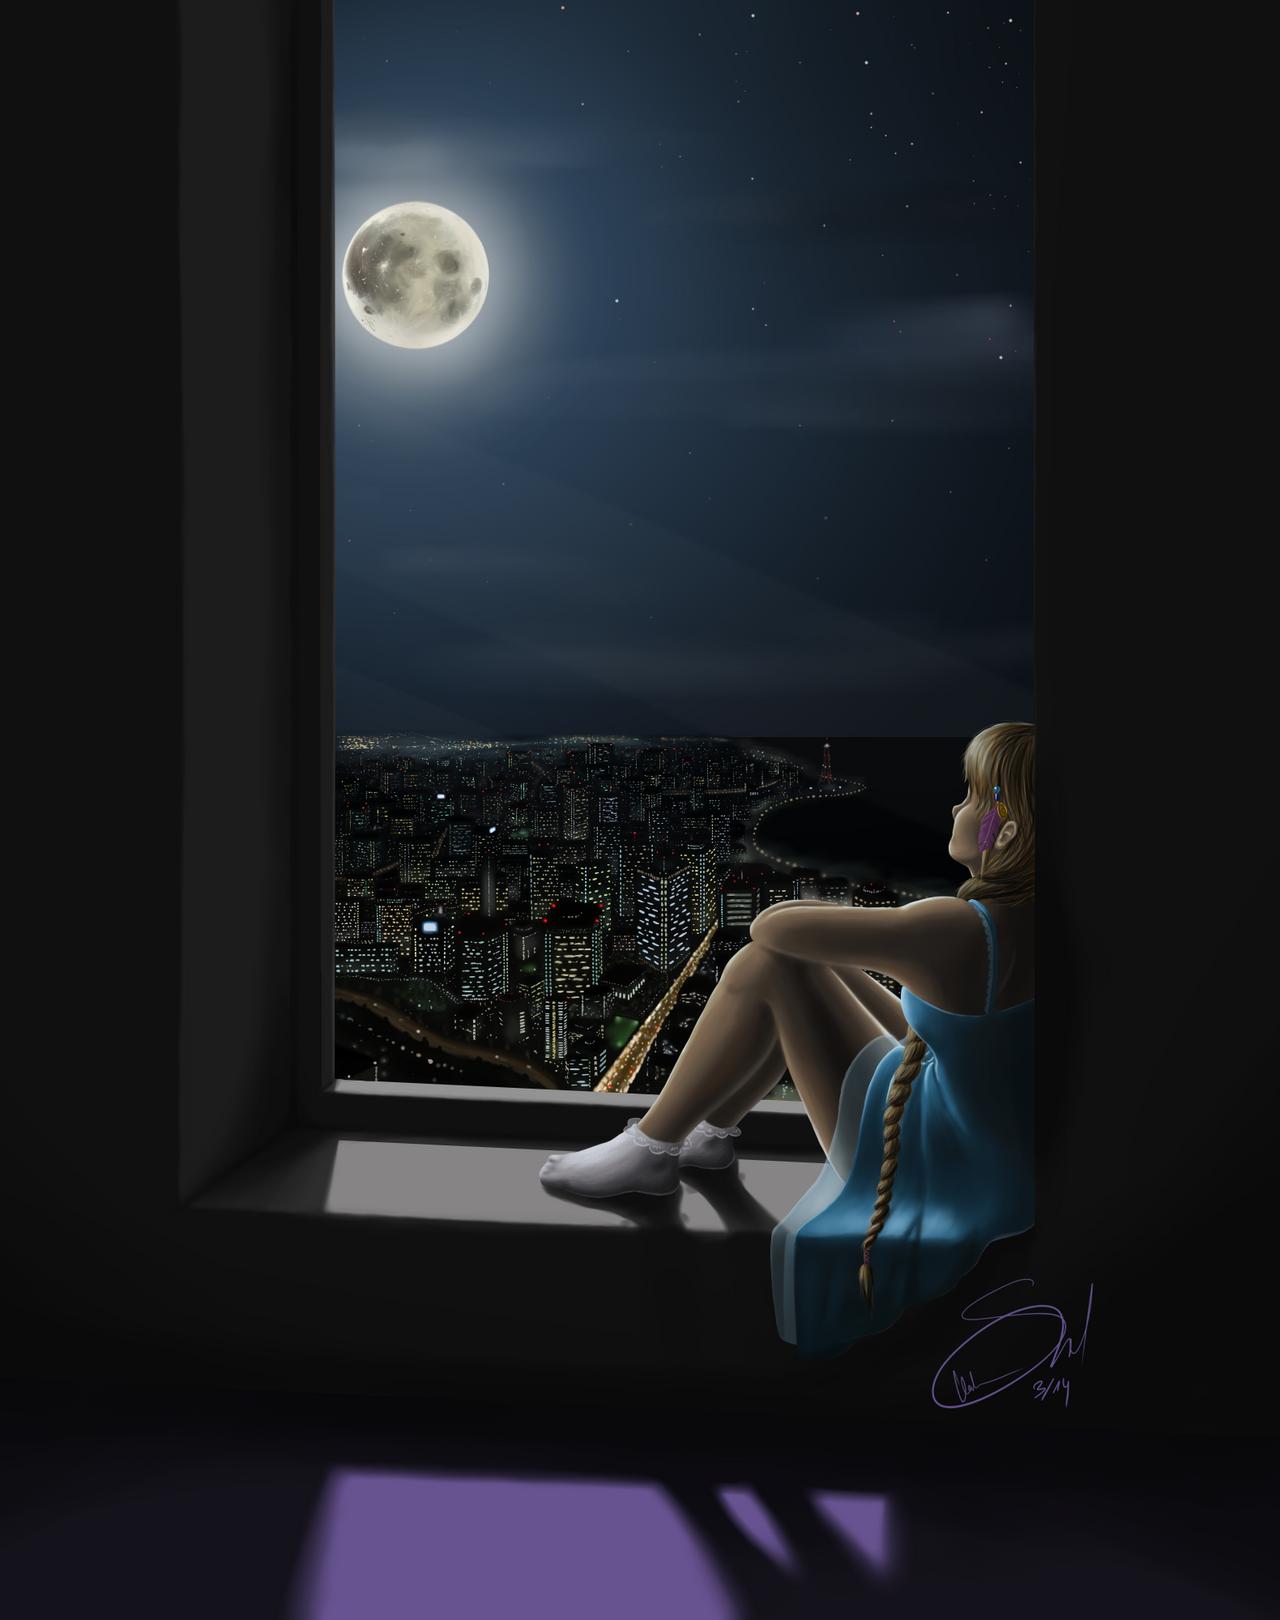 Moonstruck by Vaccoon